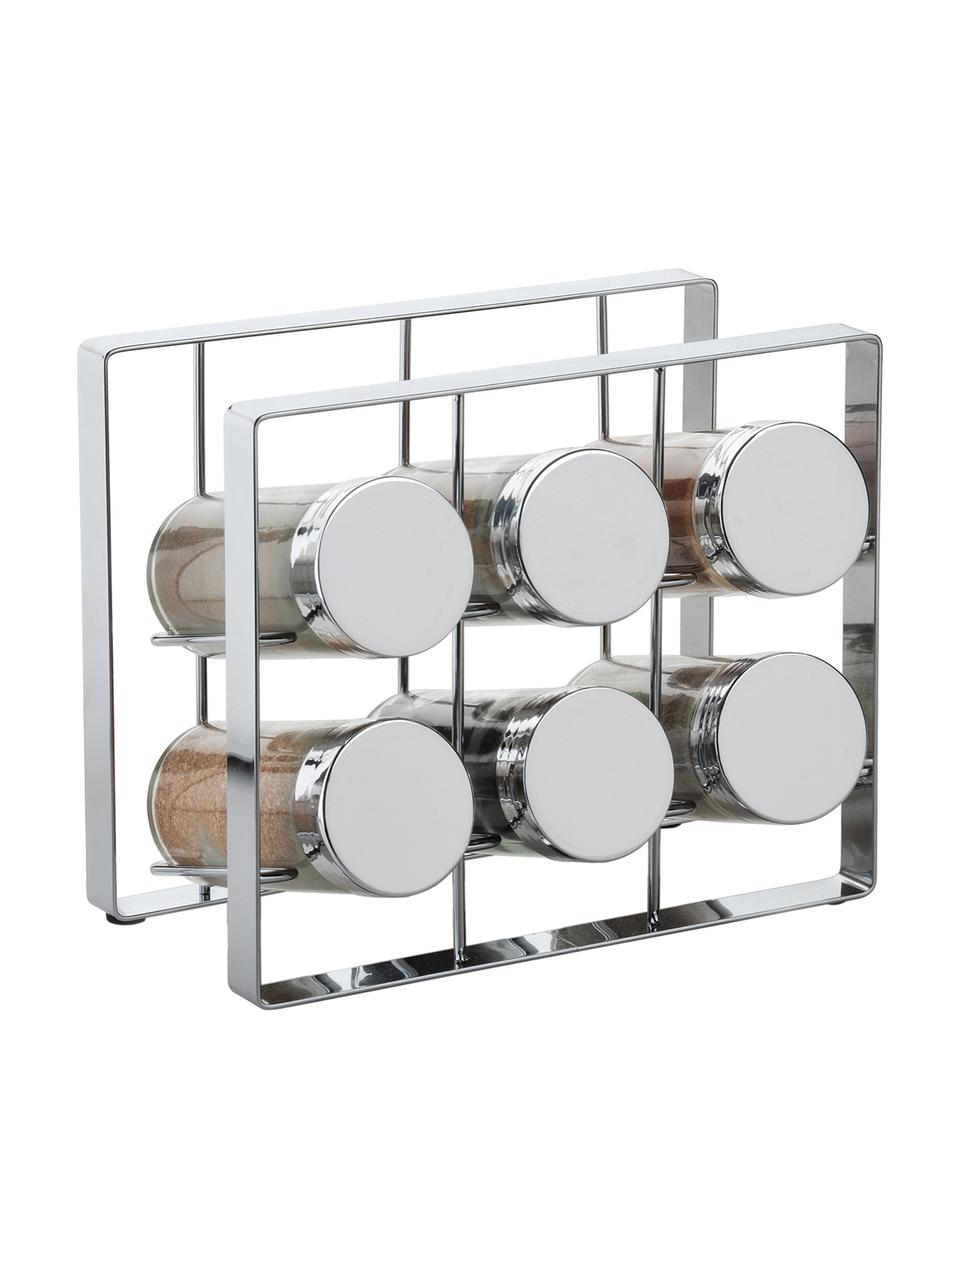 Set portaspezie con contenitori Spices 7 pz, Argentato, Larg. 18 x Alt.15 cm